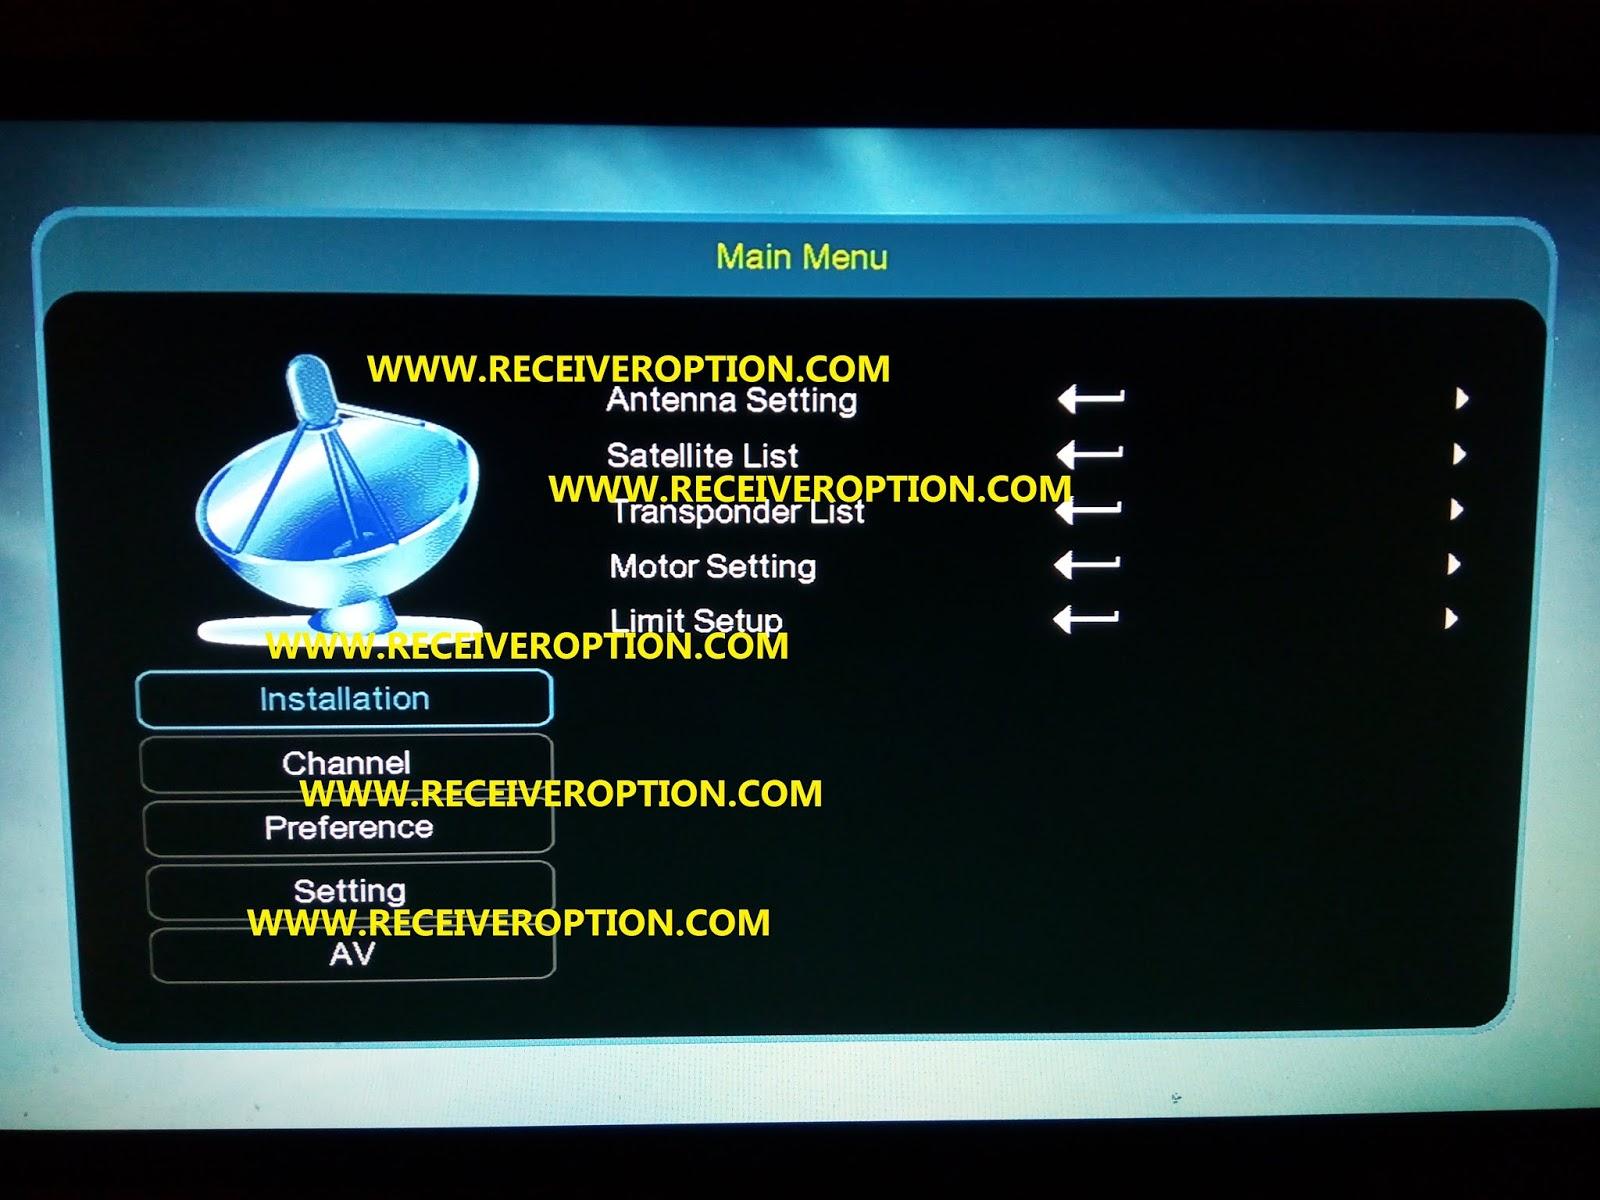 ACCESS CONTROL 2778 TYPE 1506C V1 6 AND V1 7 POWERVU KEY NEW